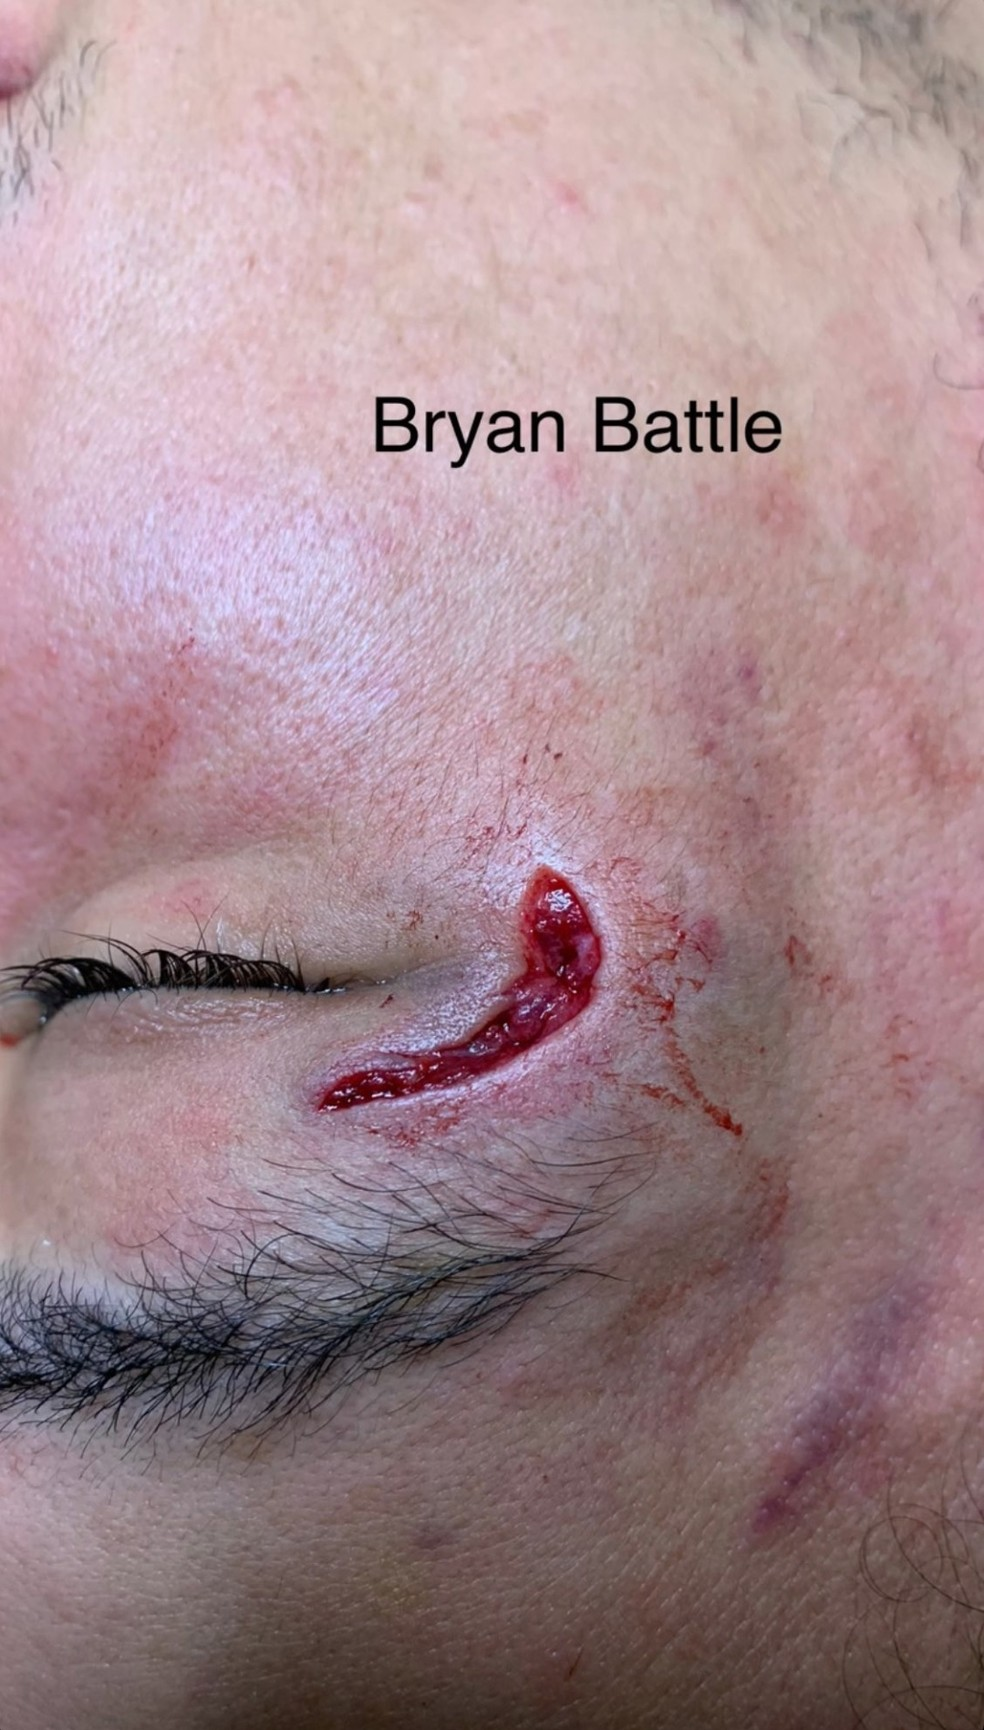 Bryan Battle antes